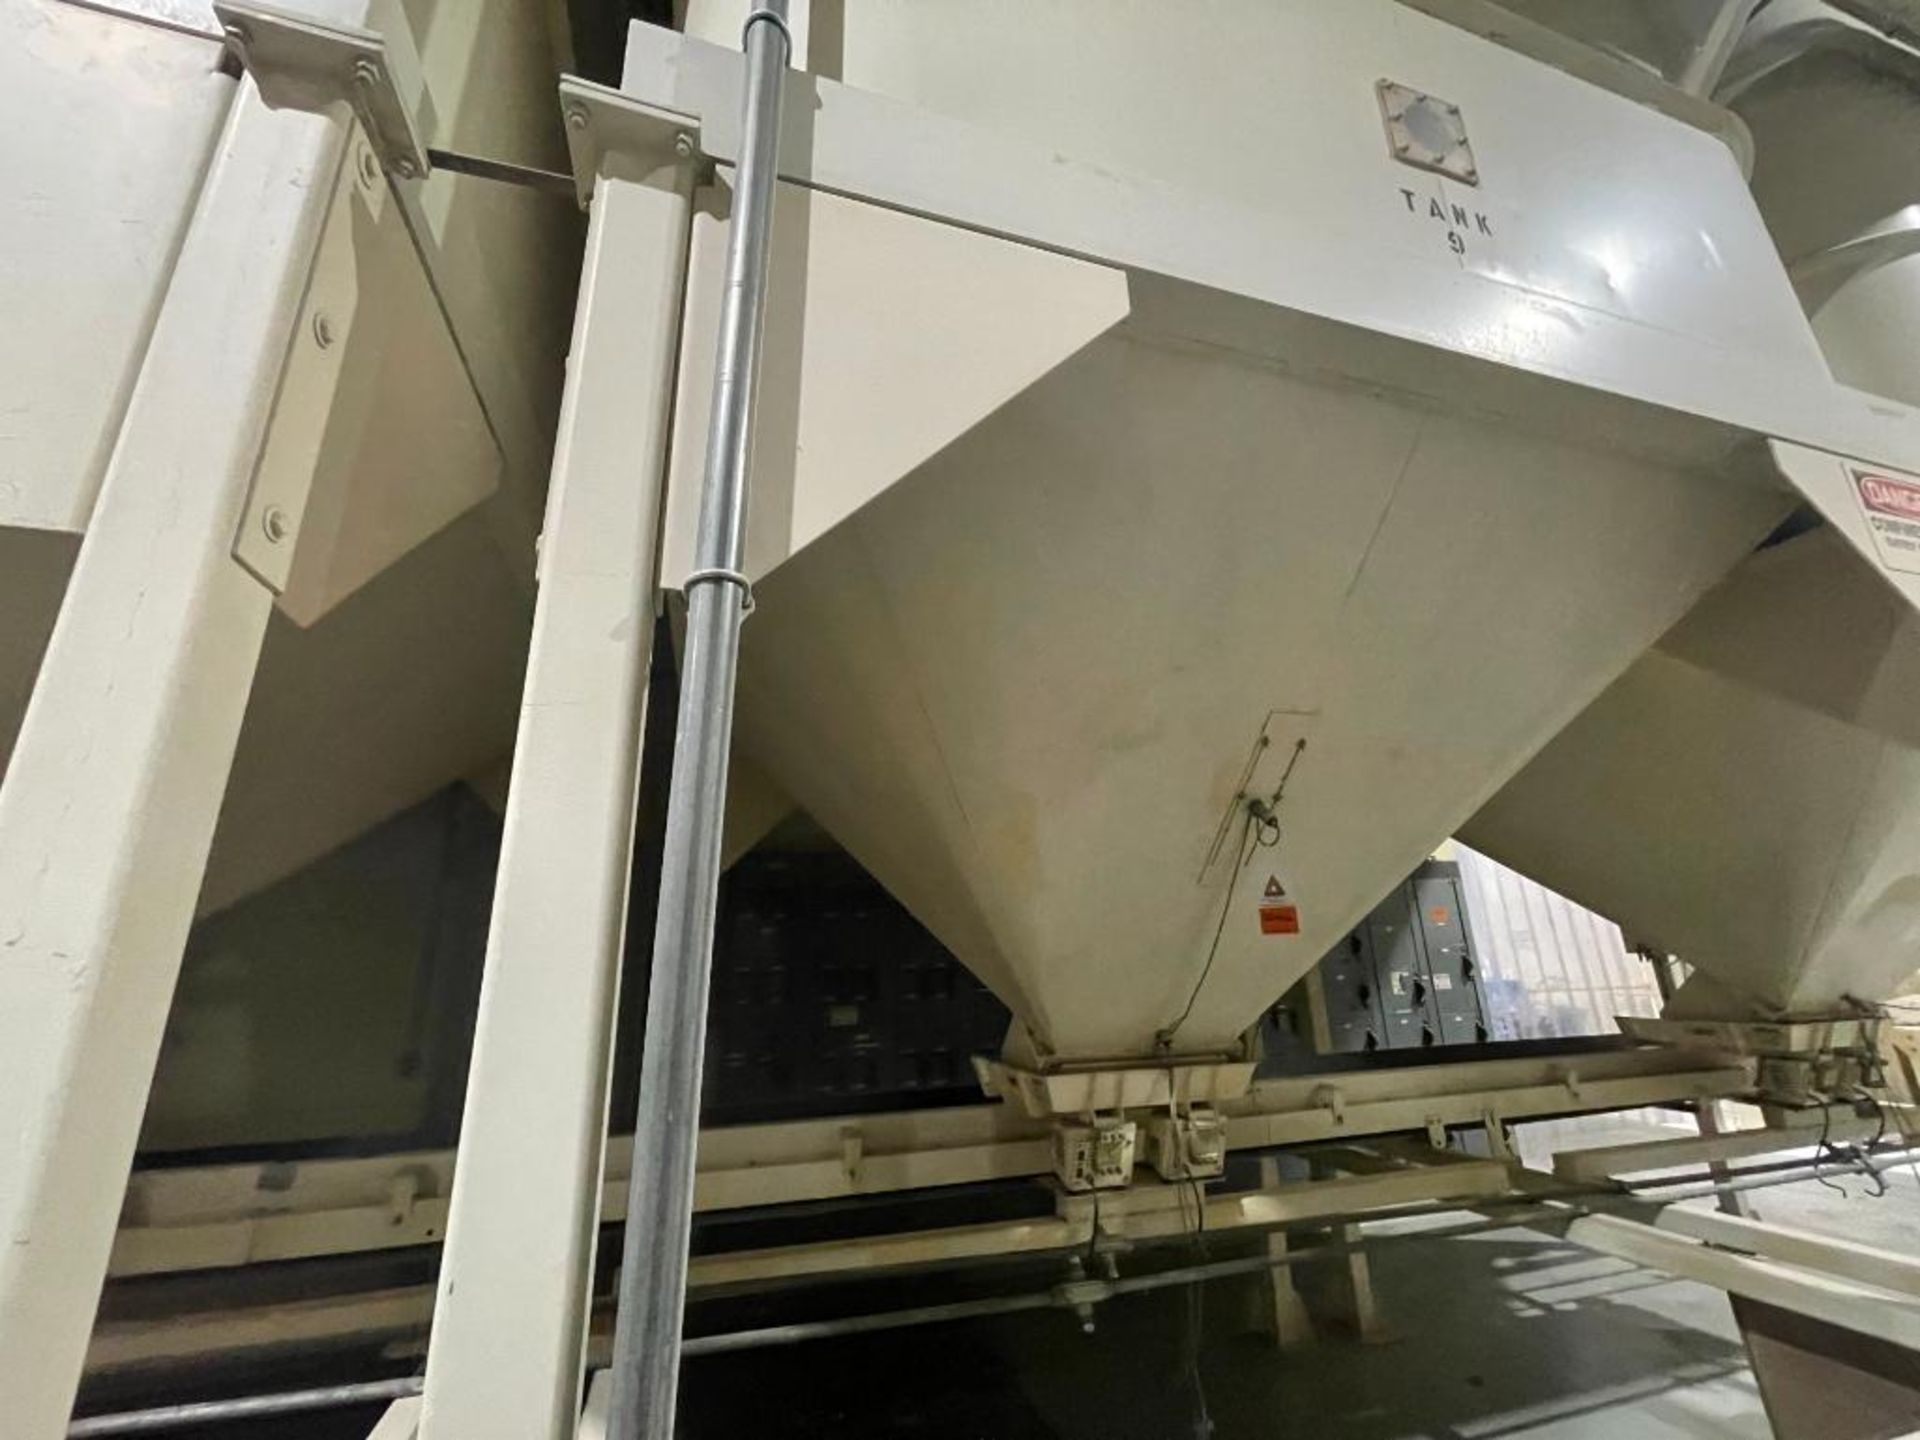 Aseeco mild steel cone bottom bulk storage bin - Image 12 of 31